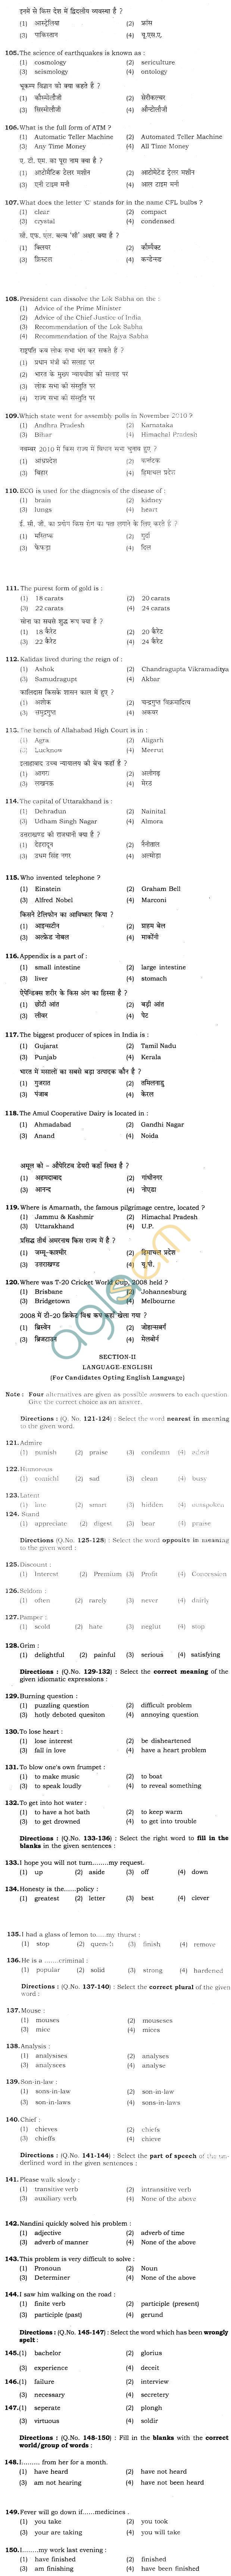 BHU UET 2011 B.A.Arts Question Paper